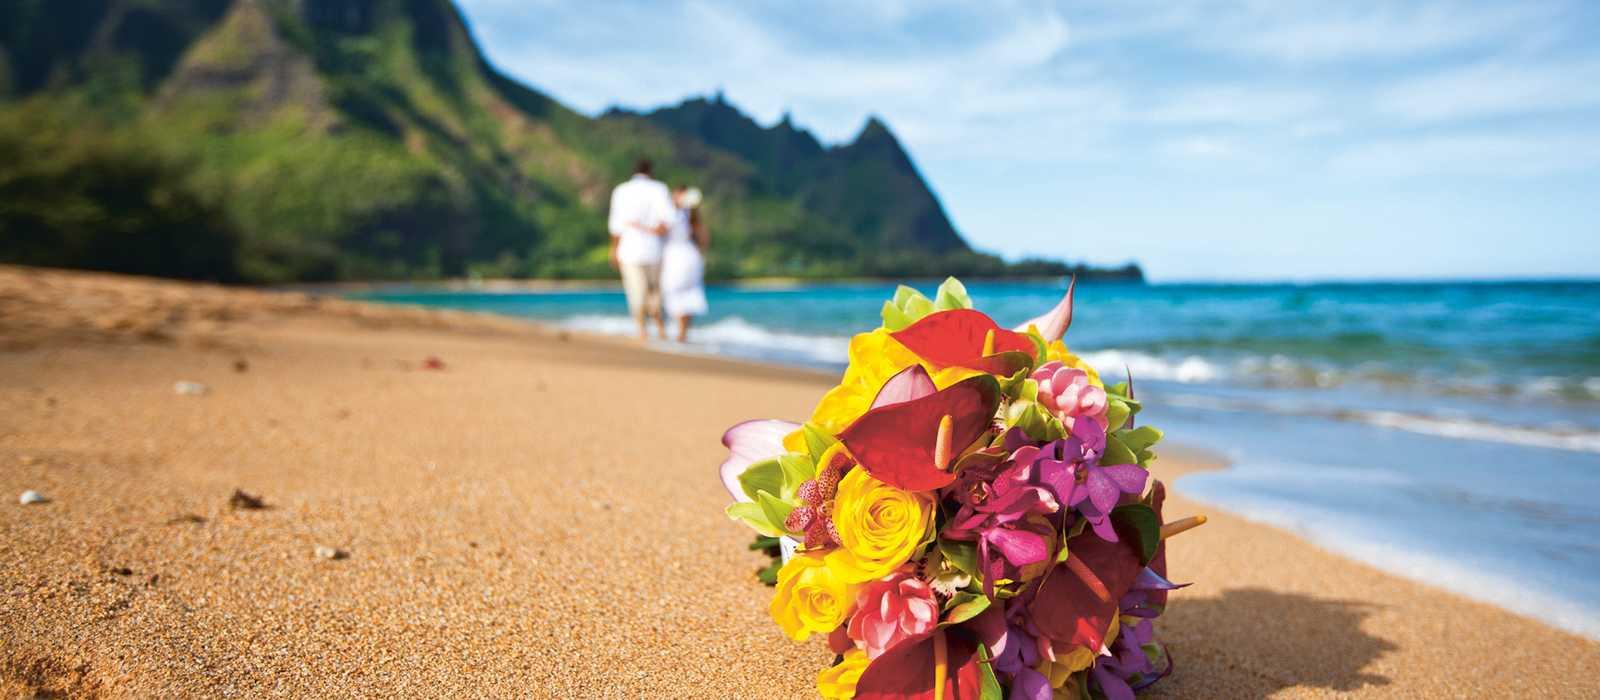 Brautstrauß am Strand von Kaua'i, Hawaii